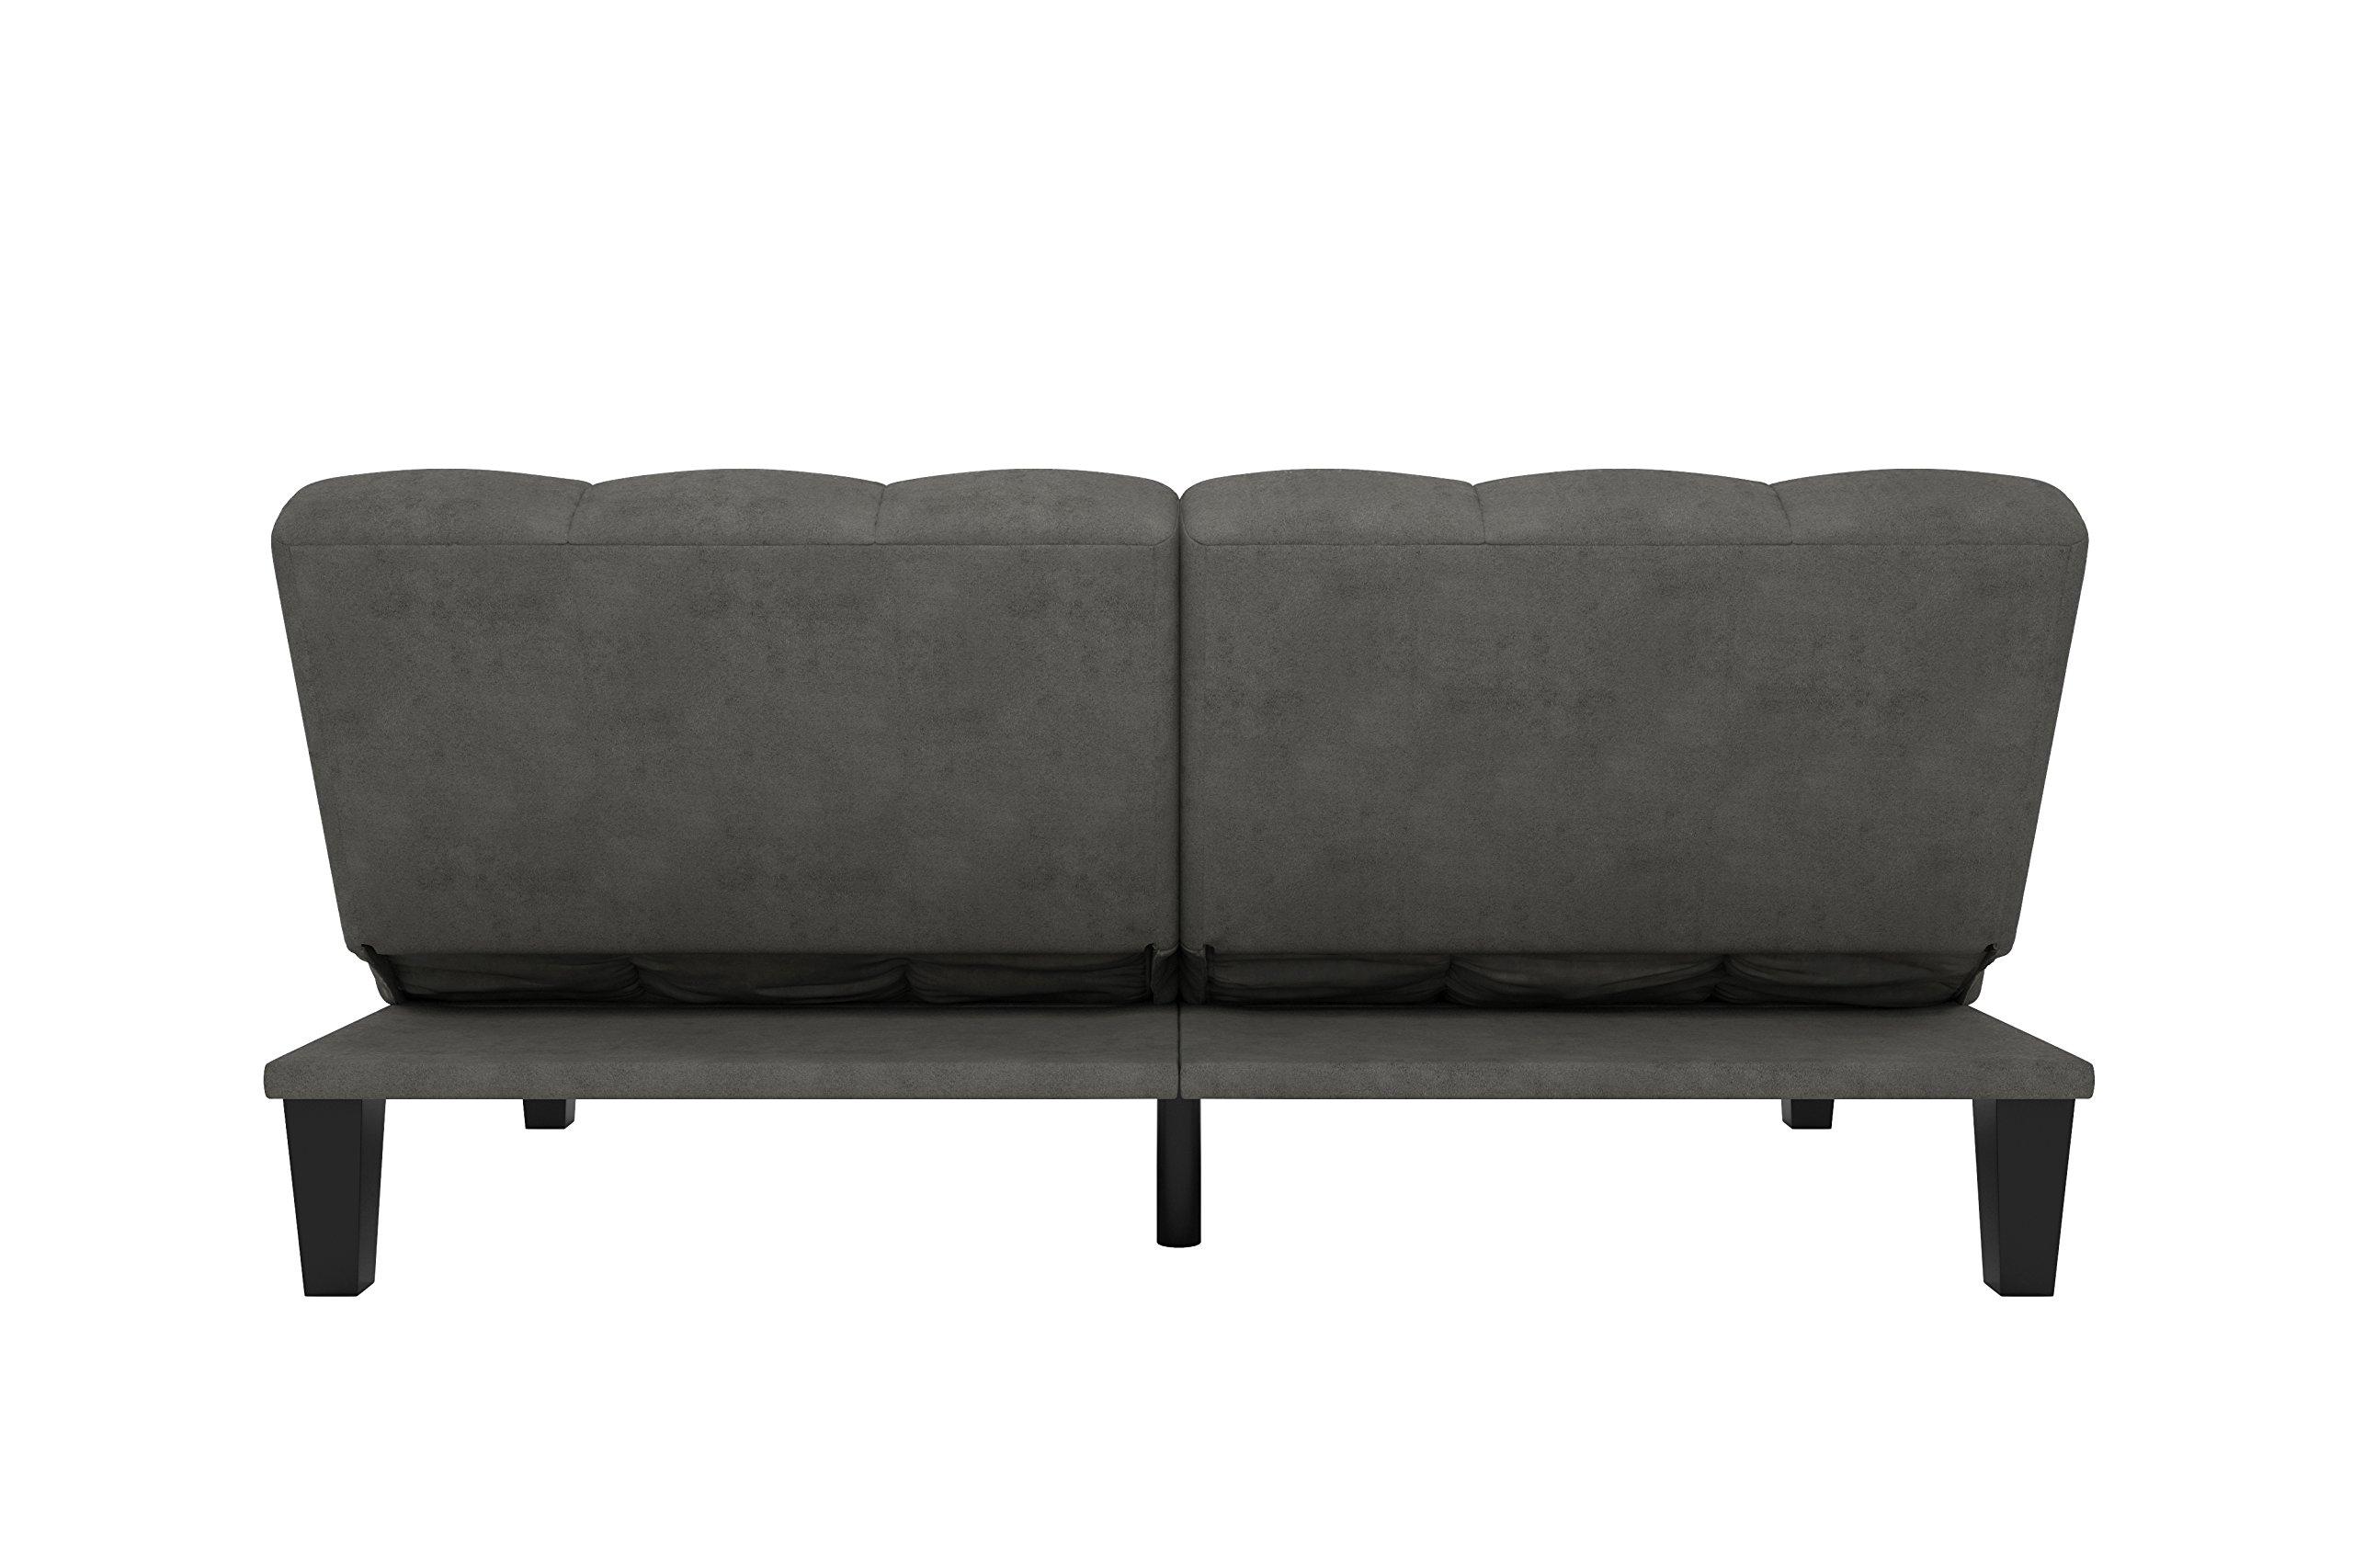 DHP Hamilton Estate Premium Sofa Futon Sleeper Comfortable Plush Upholstery, Rich Gray by DHP (Image #8)